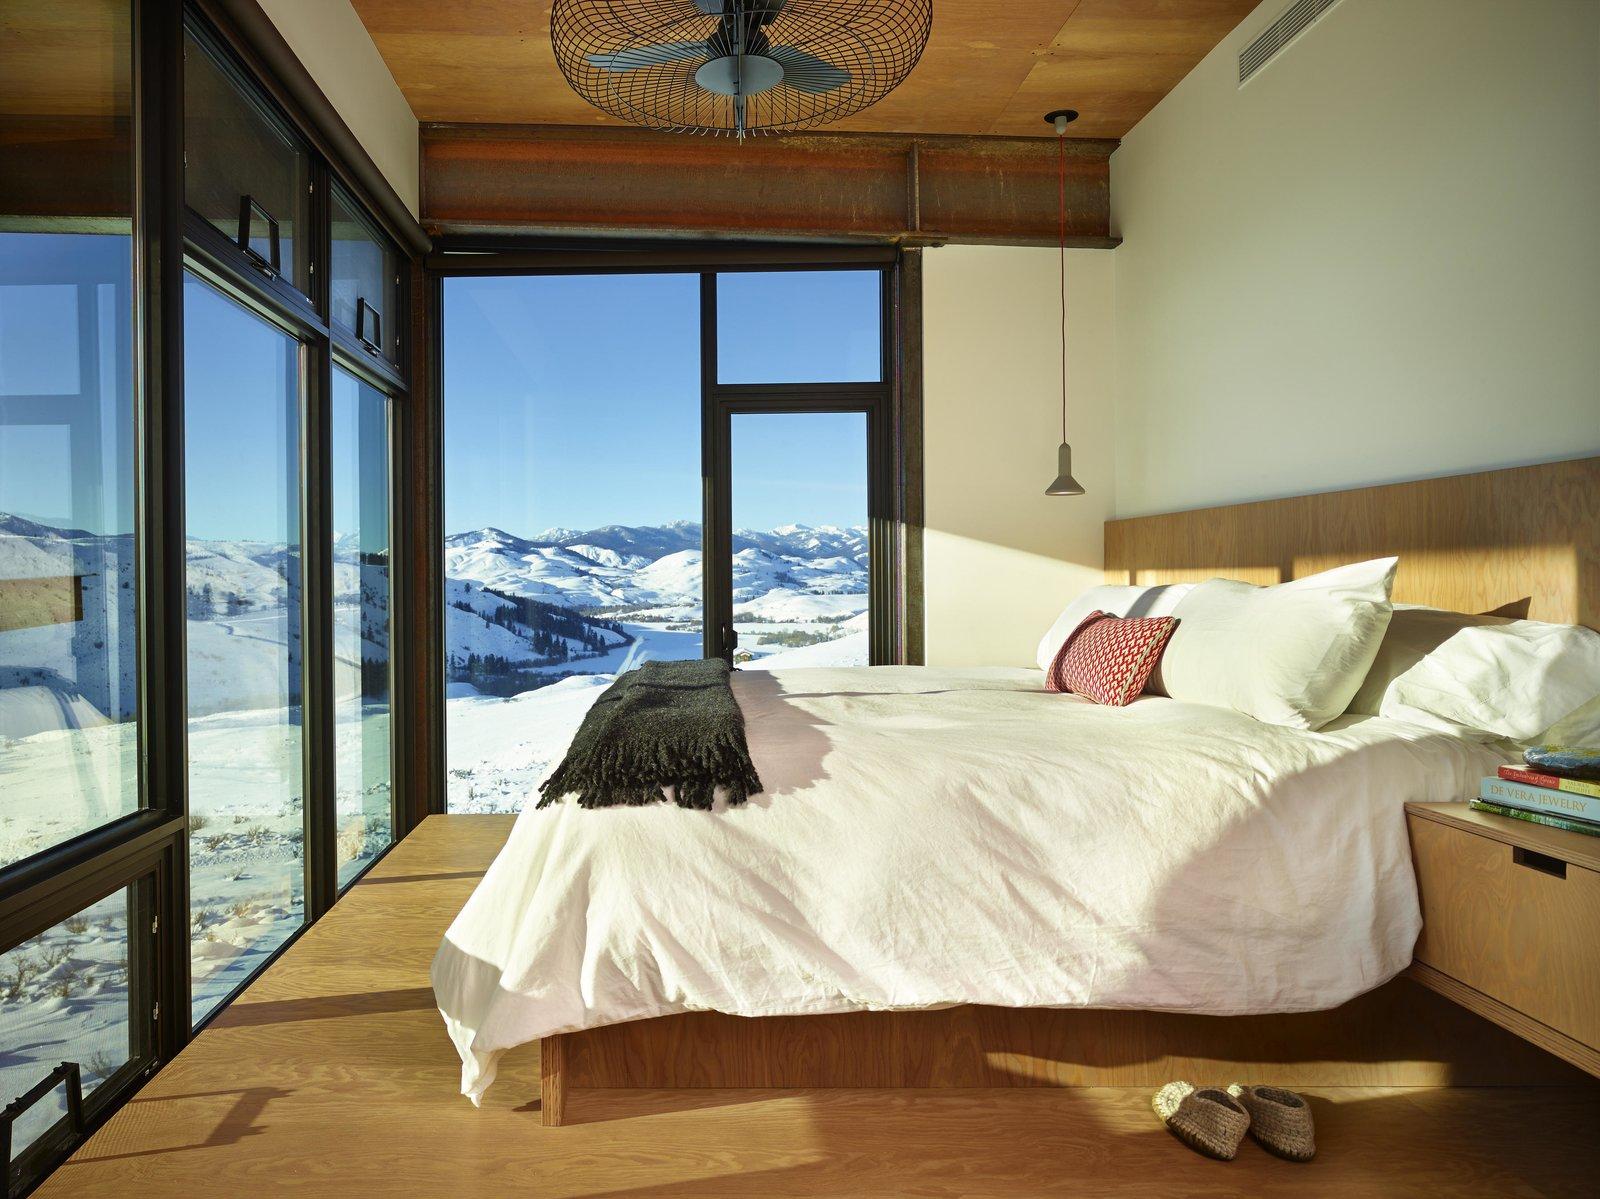 Studhorse | Olson Kundig Tagged: Bedroom, Bed, and Pendant Lighting.  Studhorse by Olson Kundig